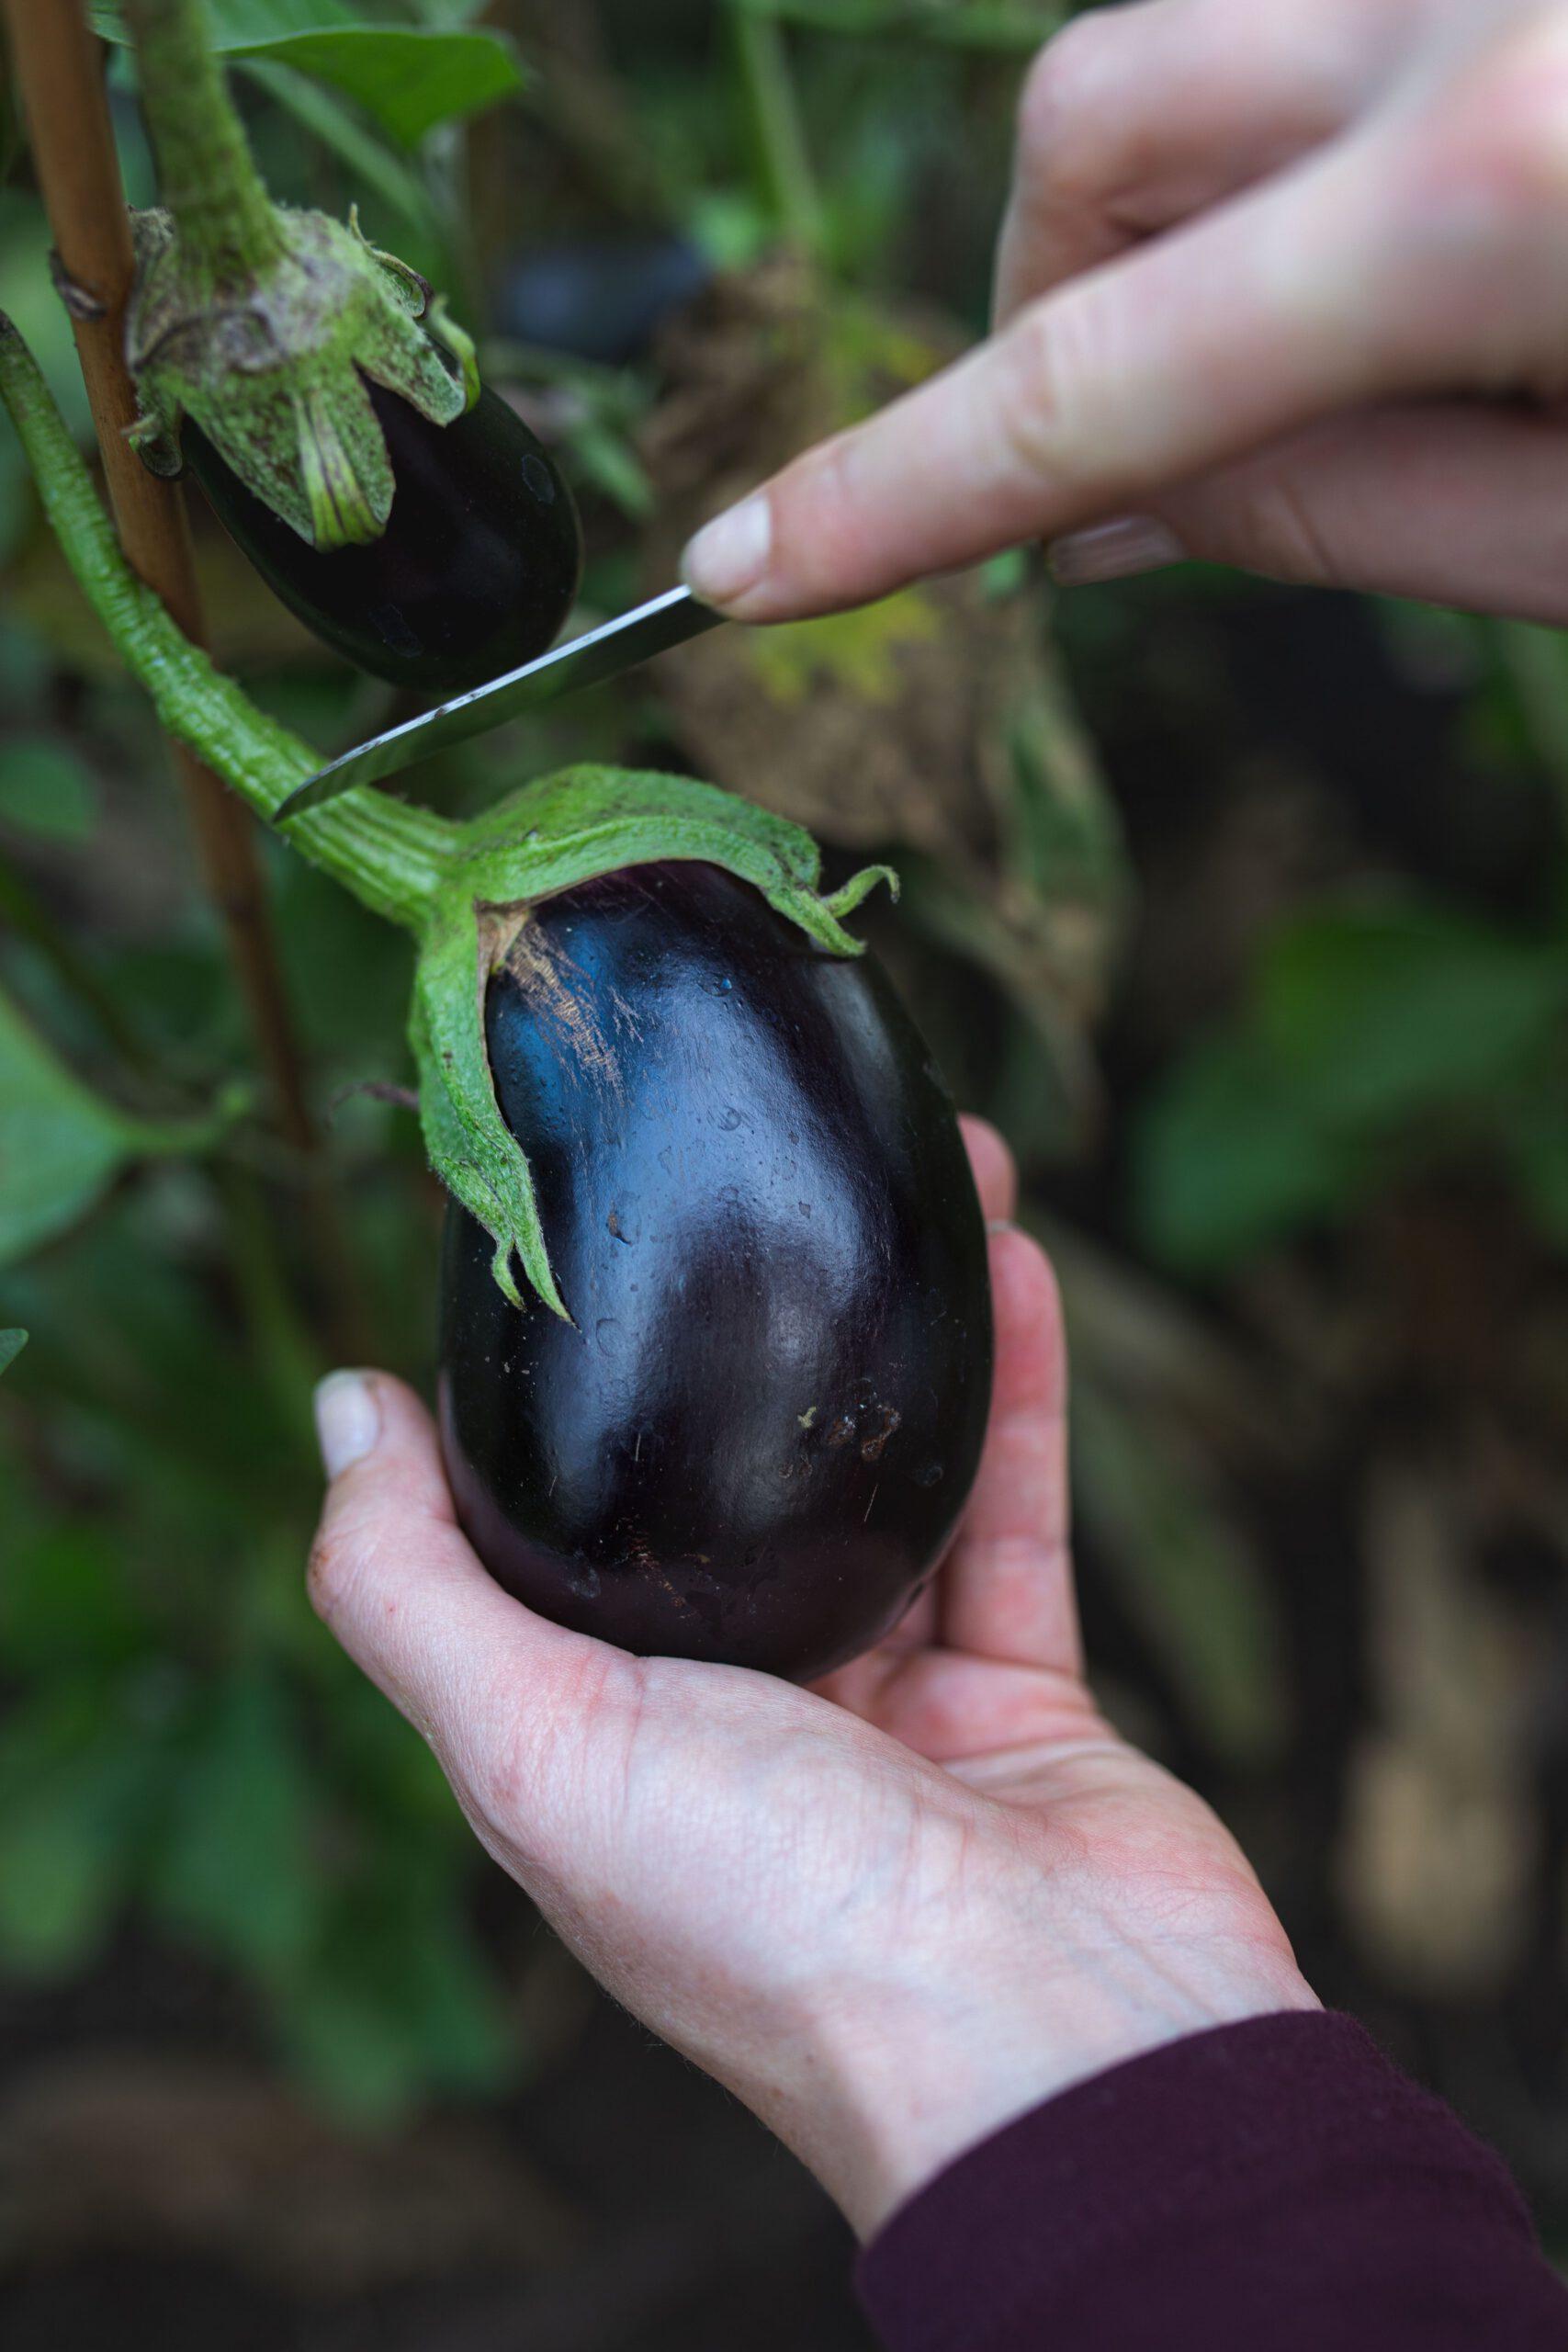 Auberginen aus dem Selbstversorger-Garten